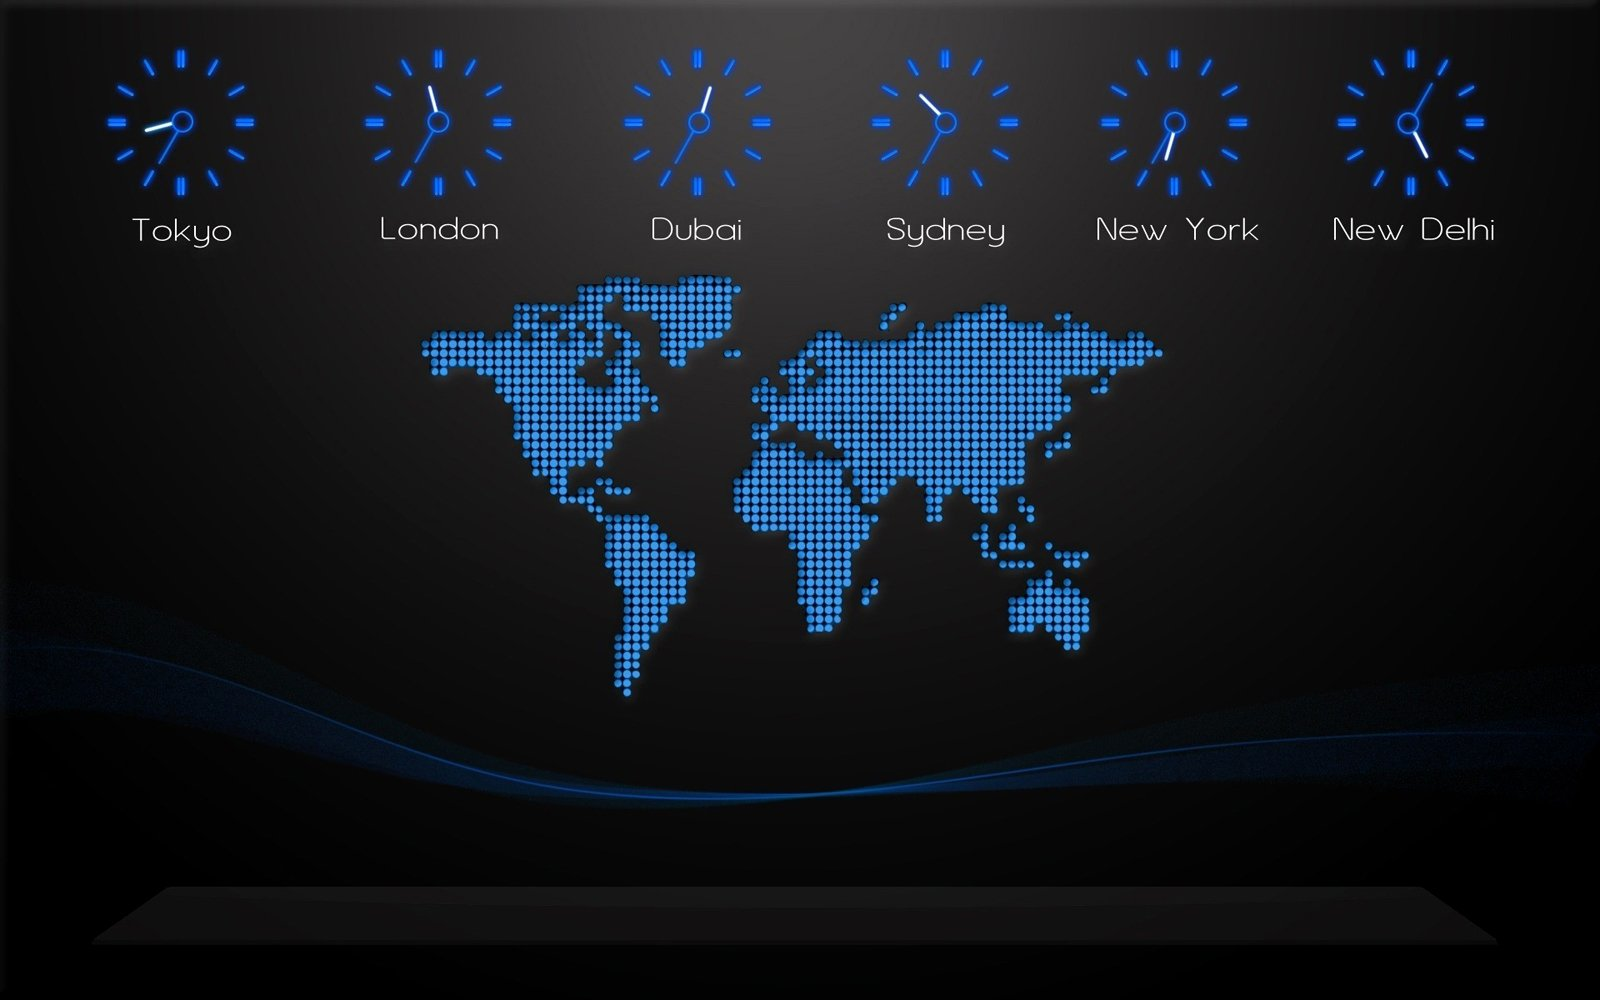 World Map on Your Desktop Creative Designs Desktop Wallpaper Download 1600x1000